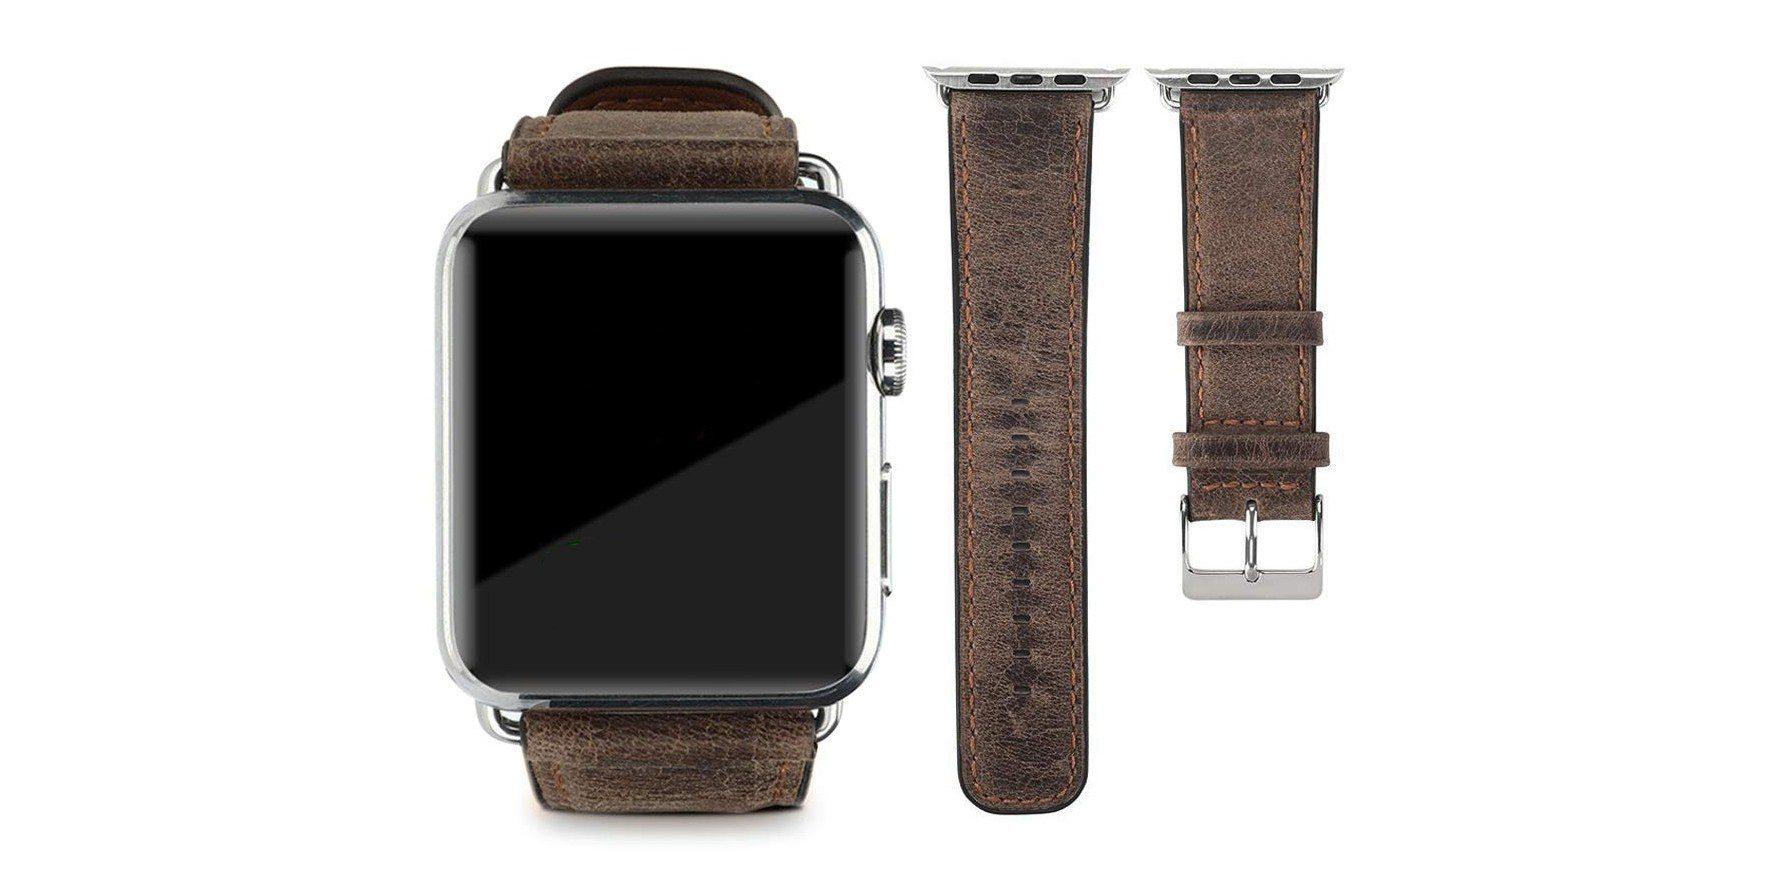 9to5Toys Last Call: Best Buy Apple Flash Sale, Arlo Pro 2